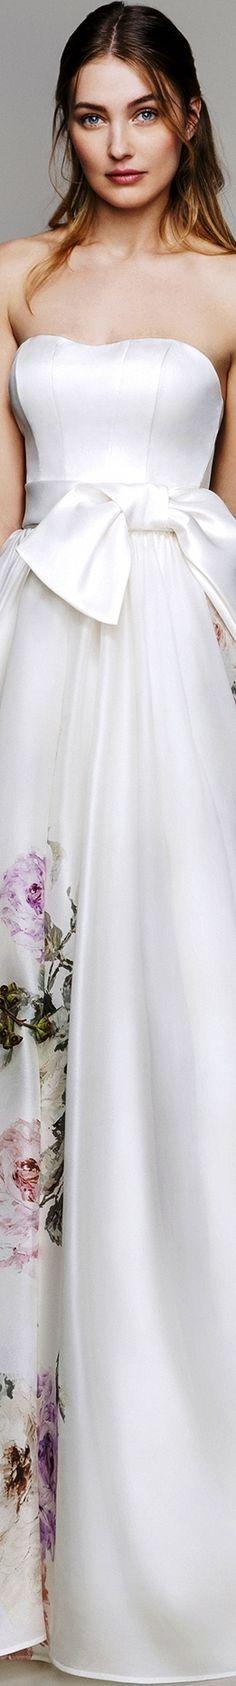 Blumarine wedding dress 2018 pictures